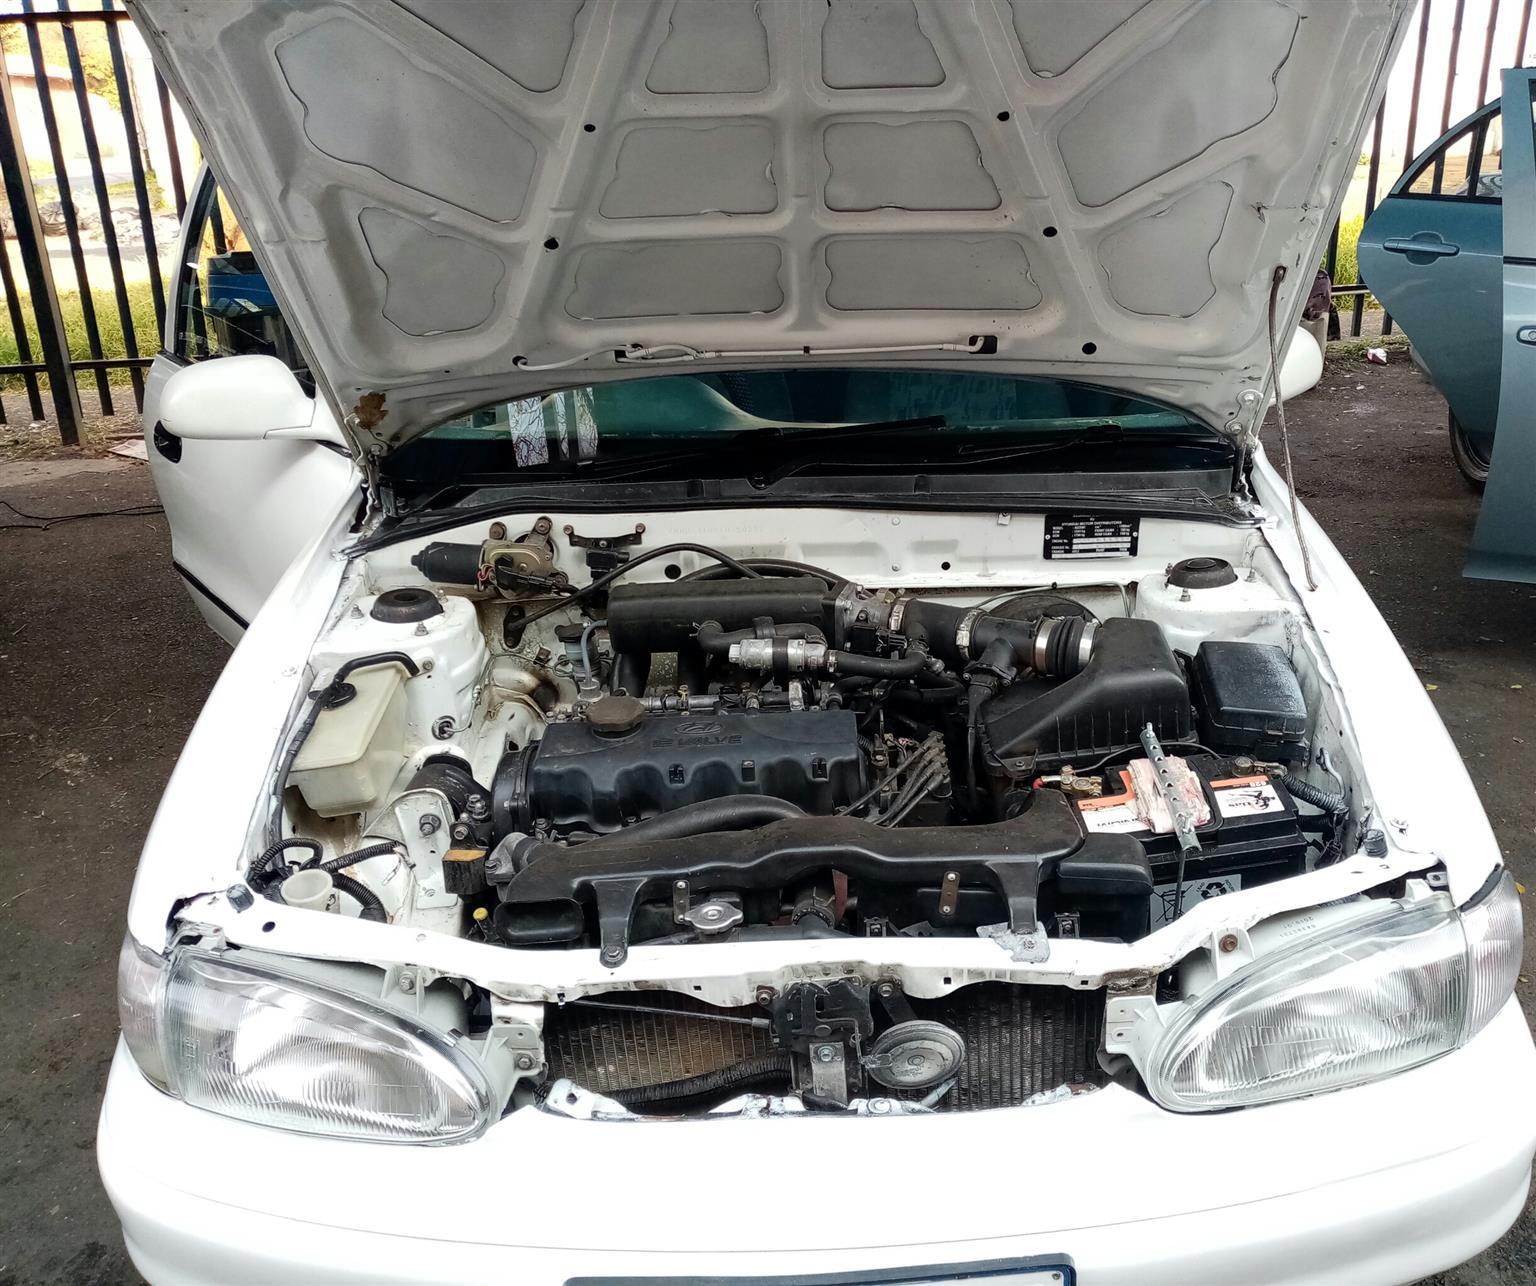 1996 Hyundai Accent 1.6 GL